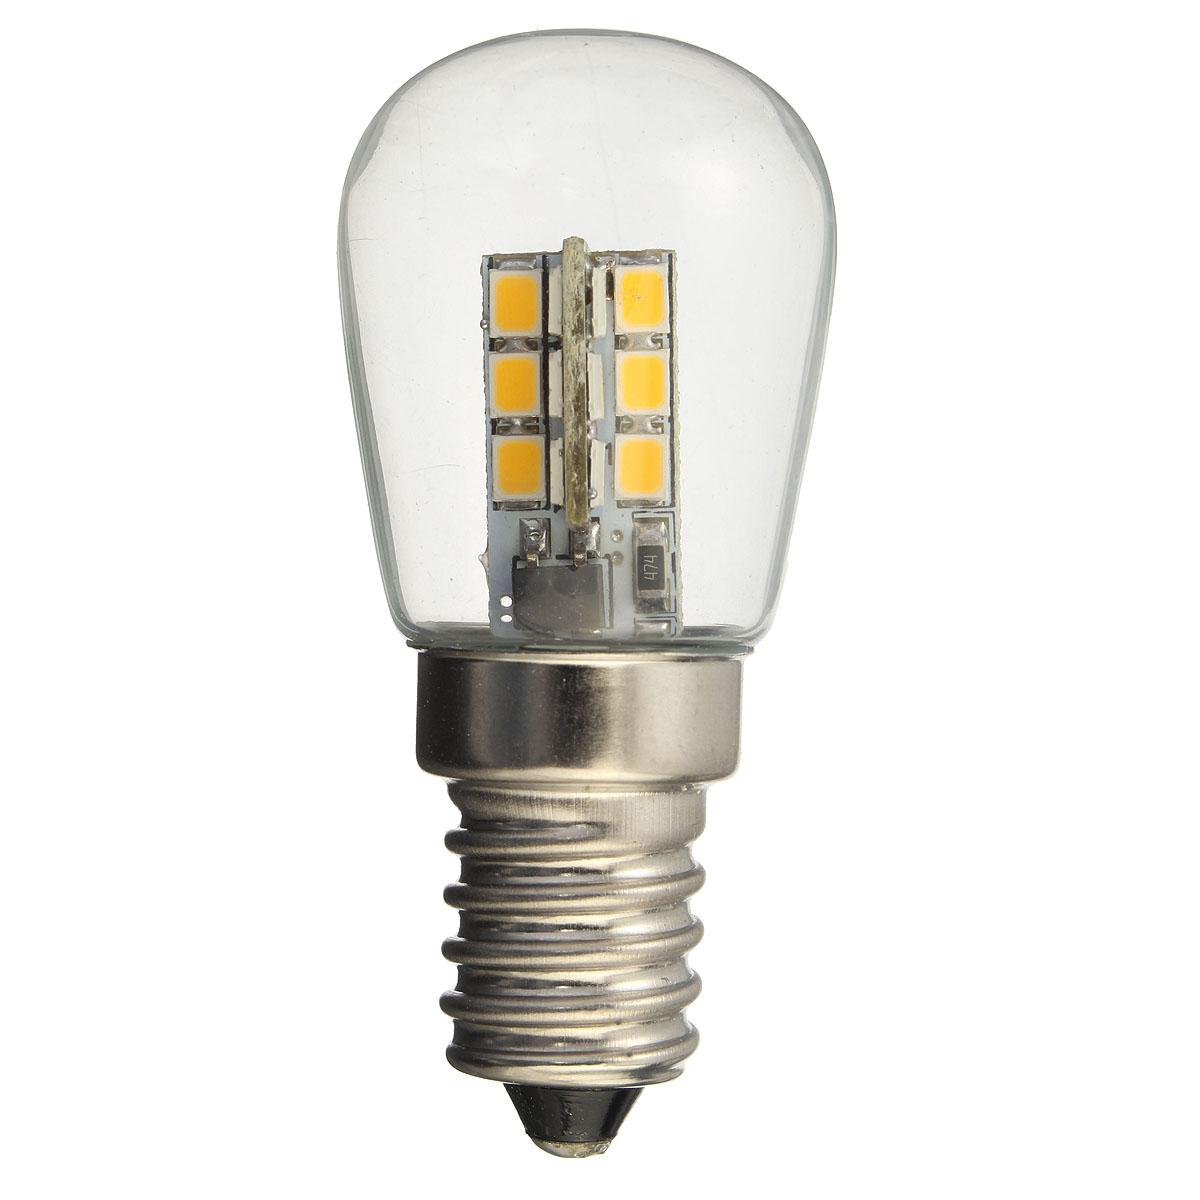 R45 Light Bulb